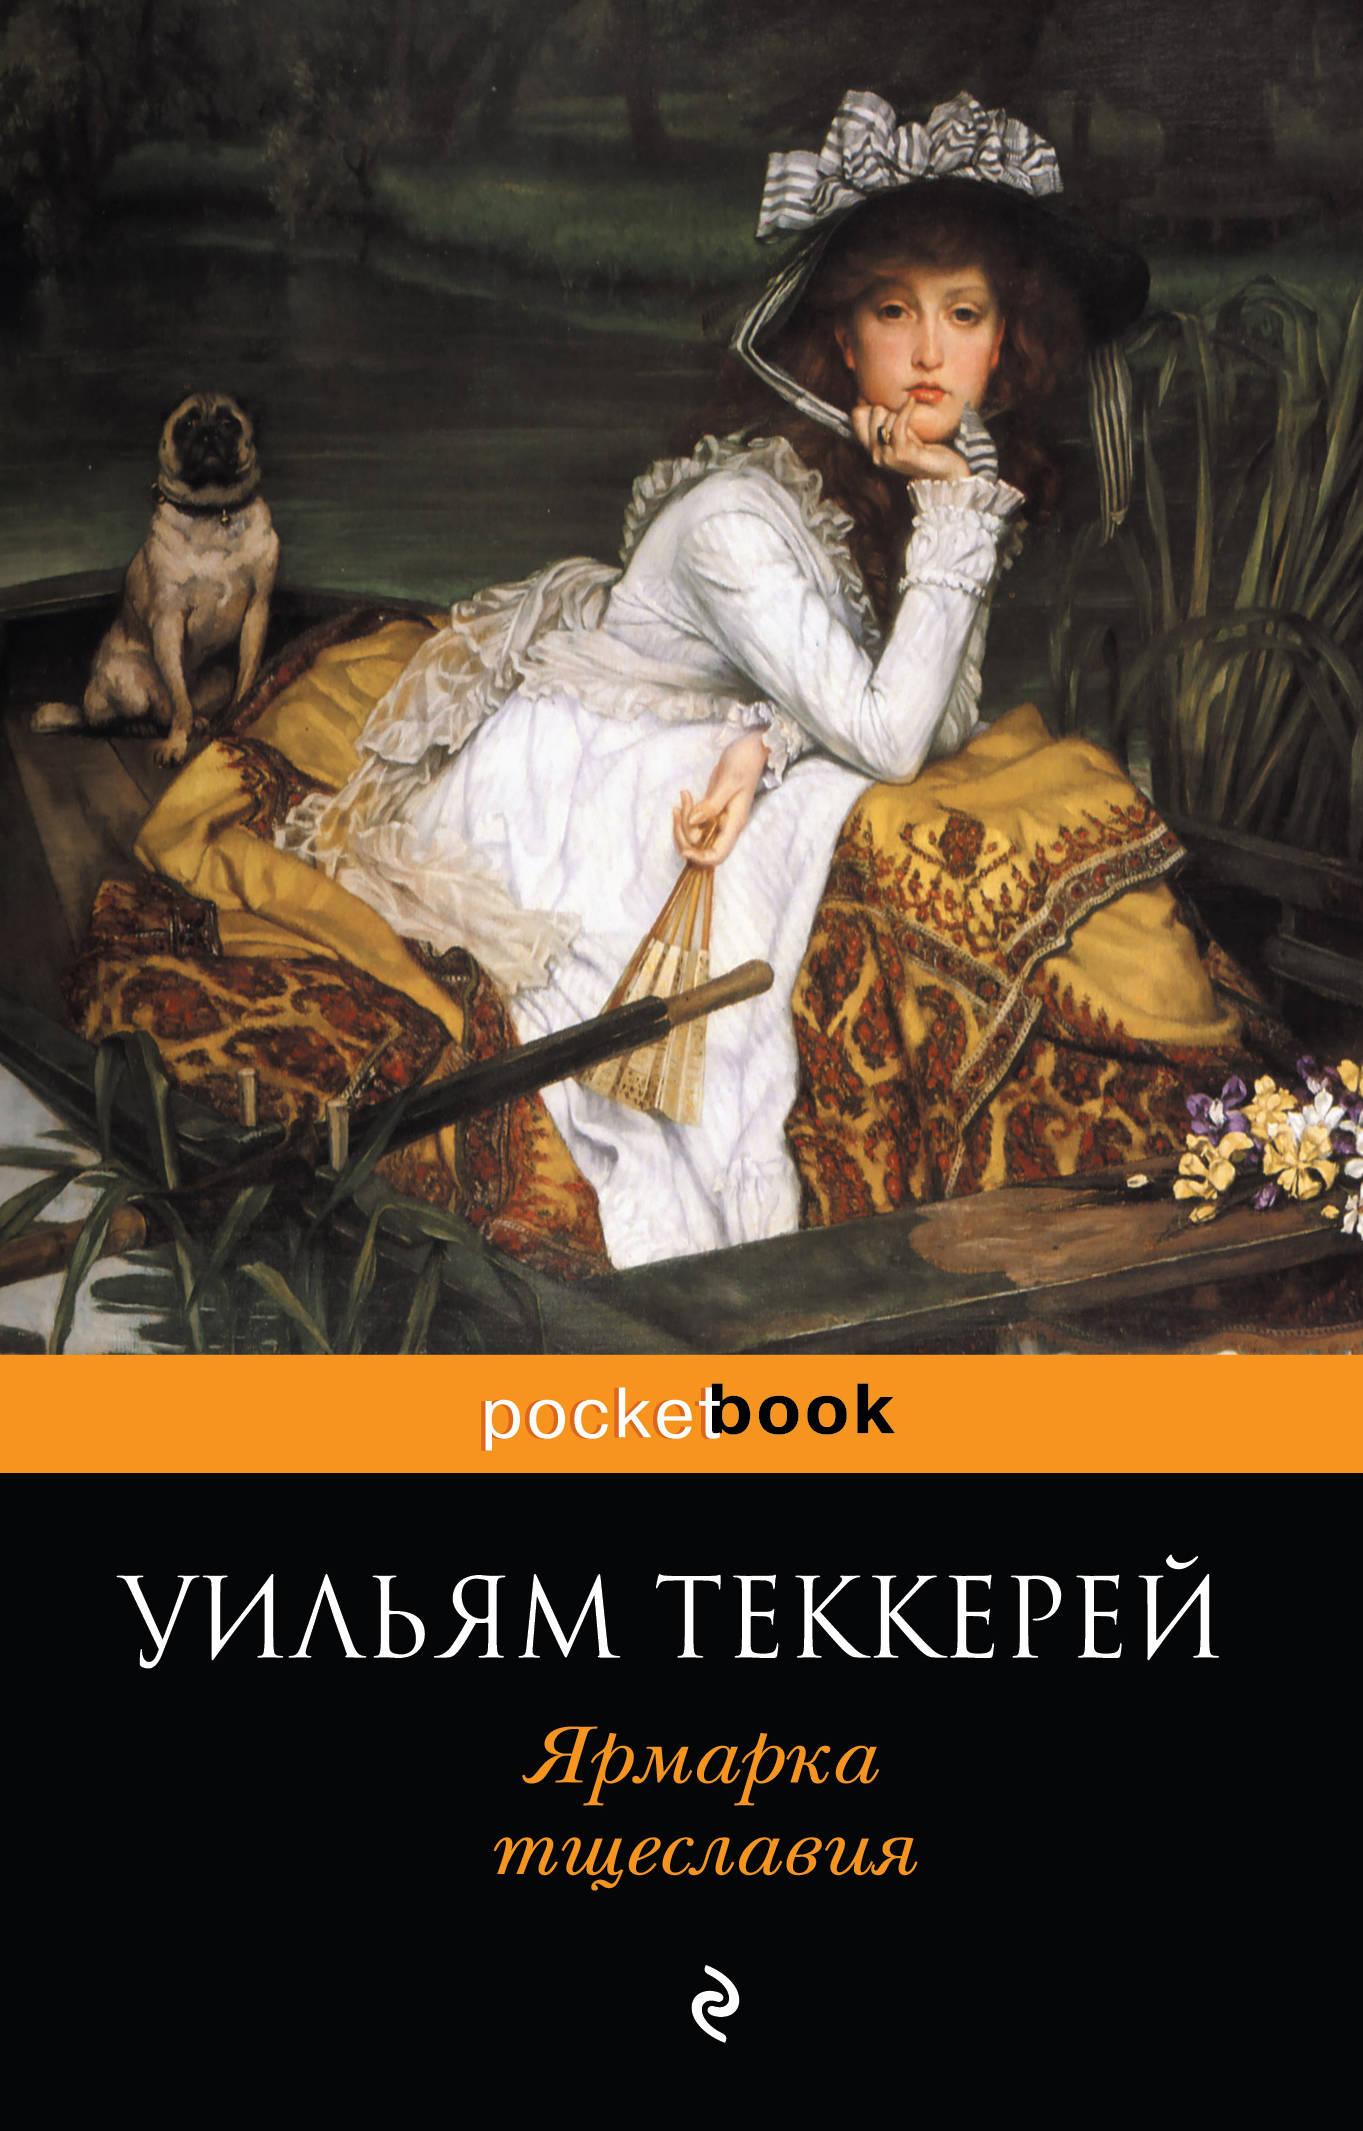 Уильям Мейкпис Теккерей Ярмарка тщеславия